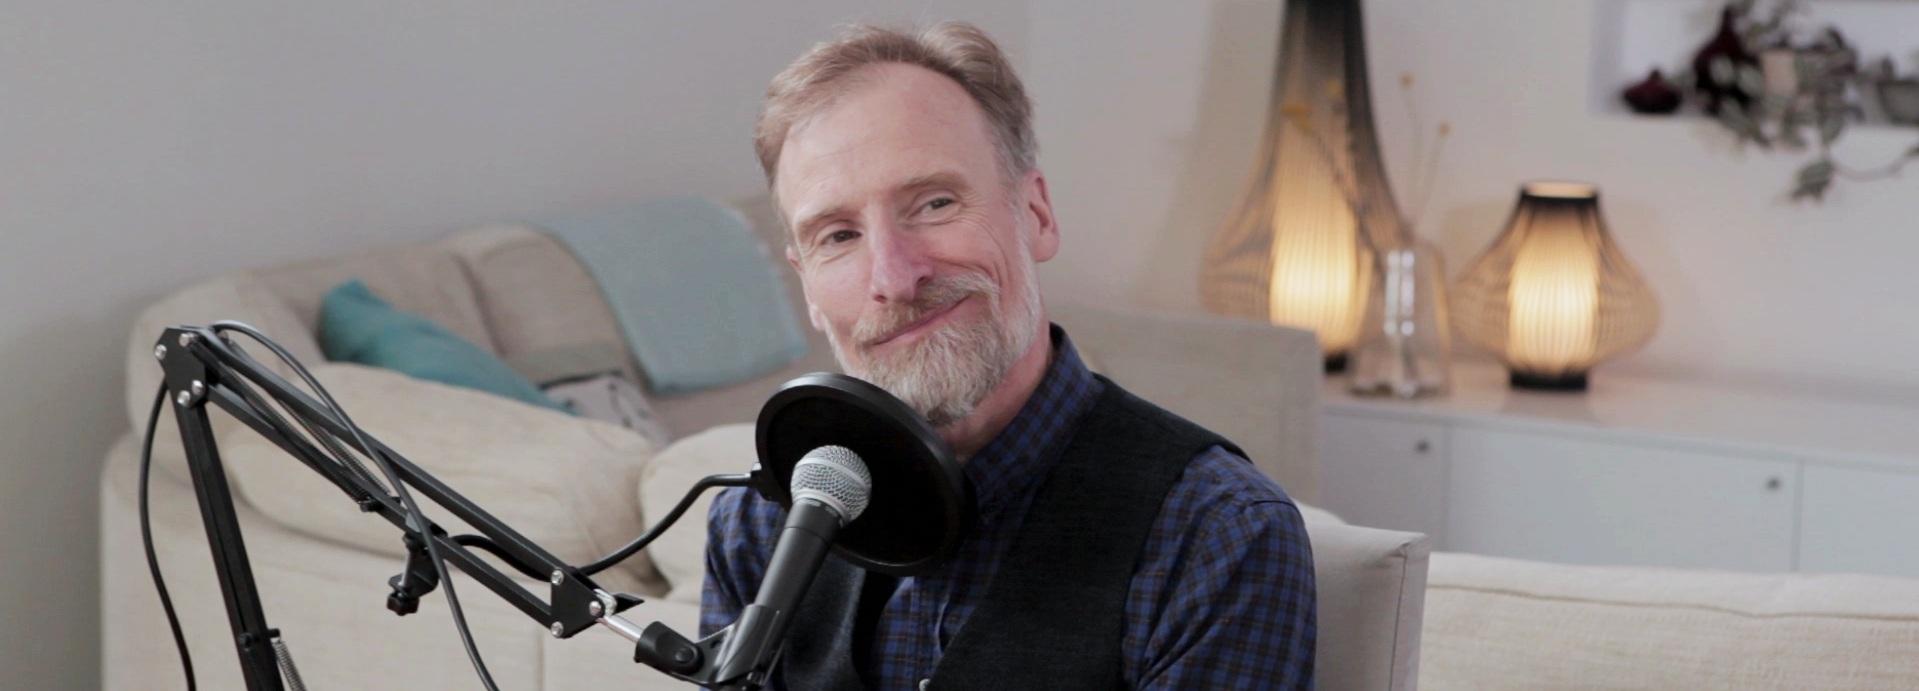 Simon_Podcast.jpg